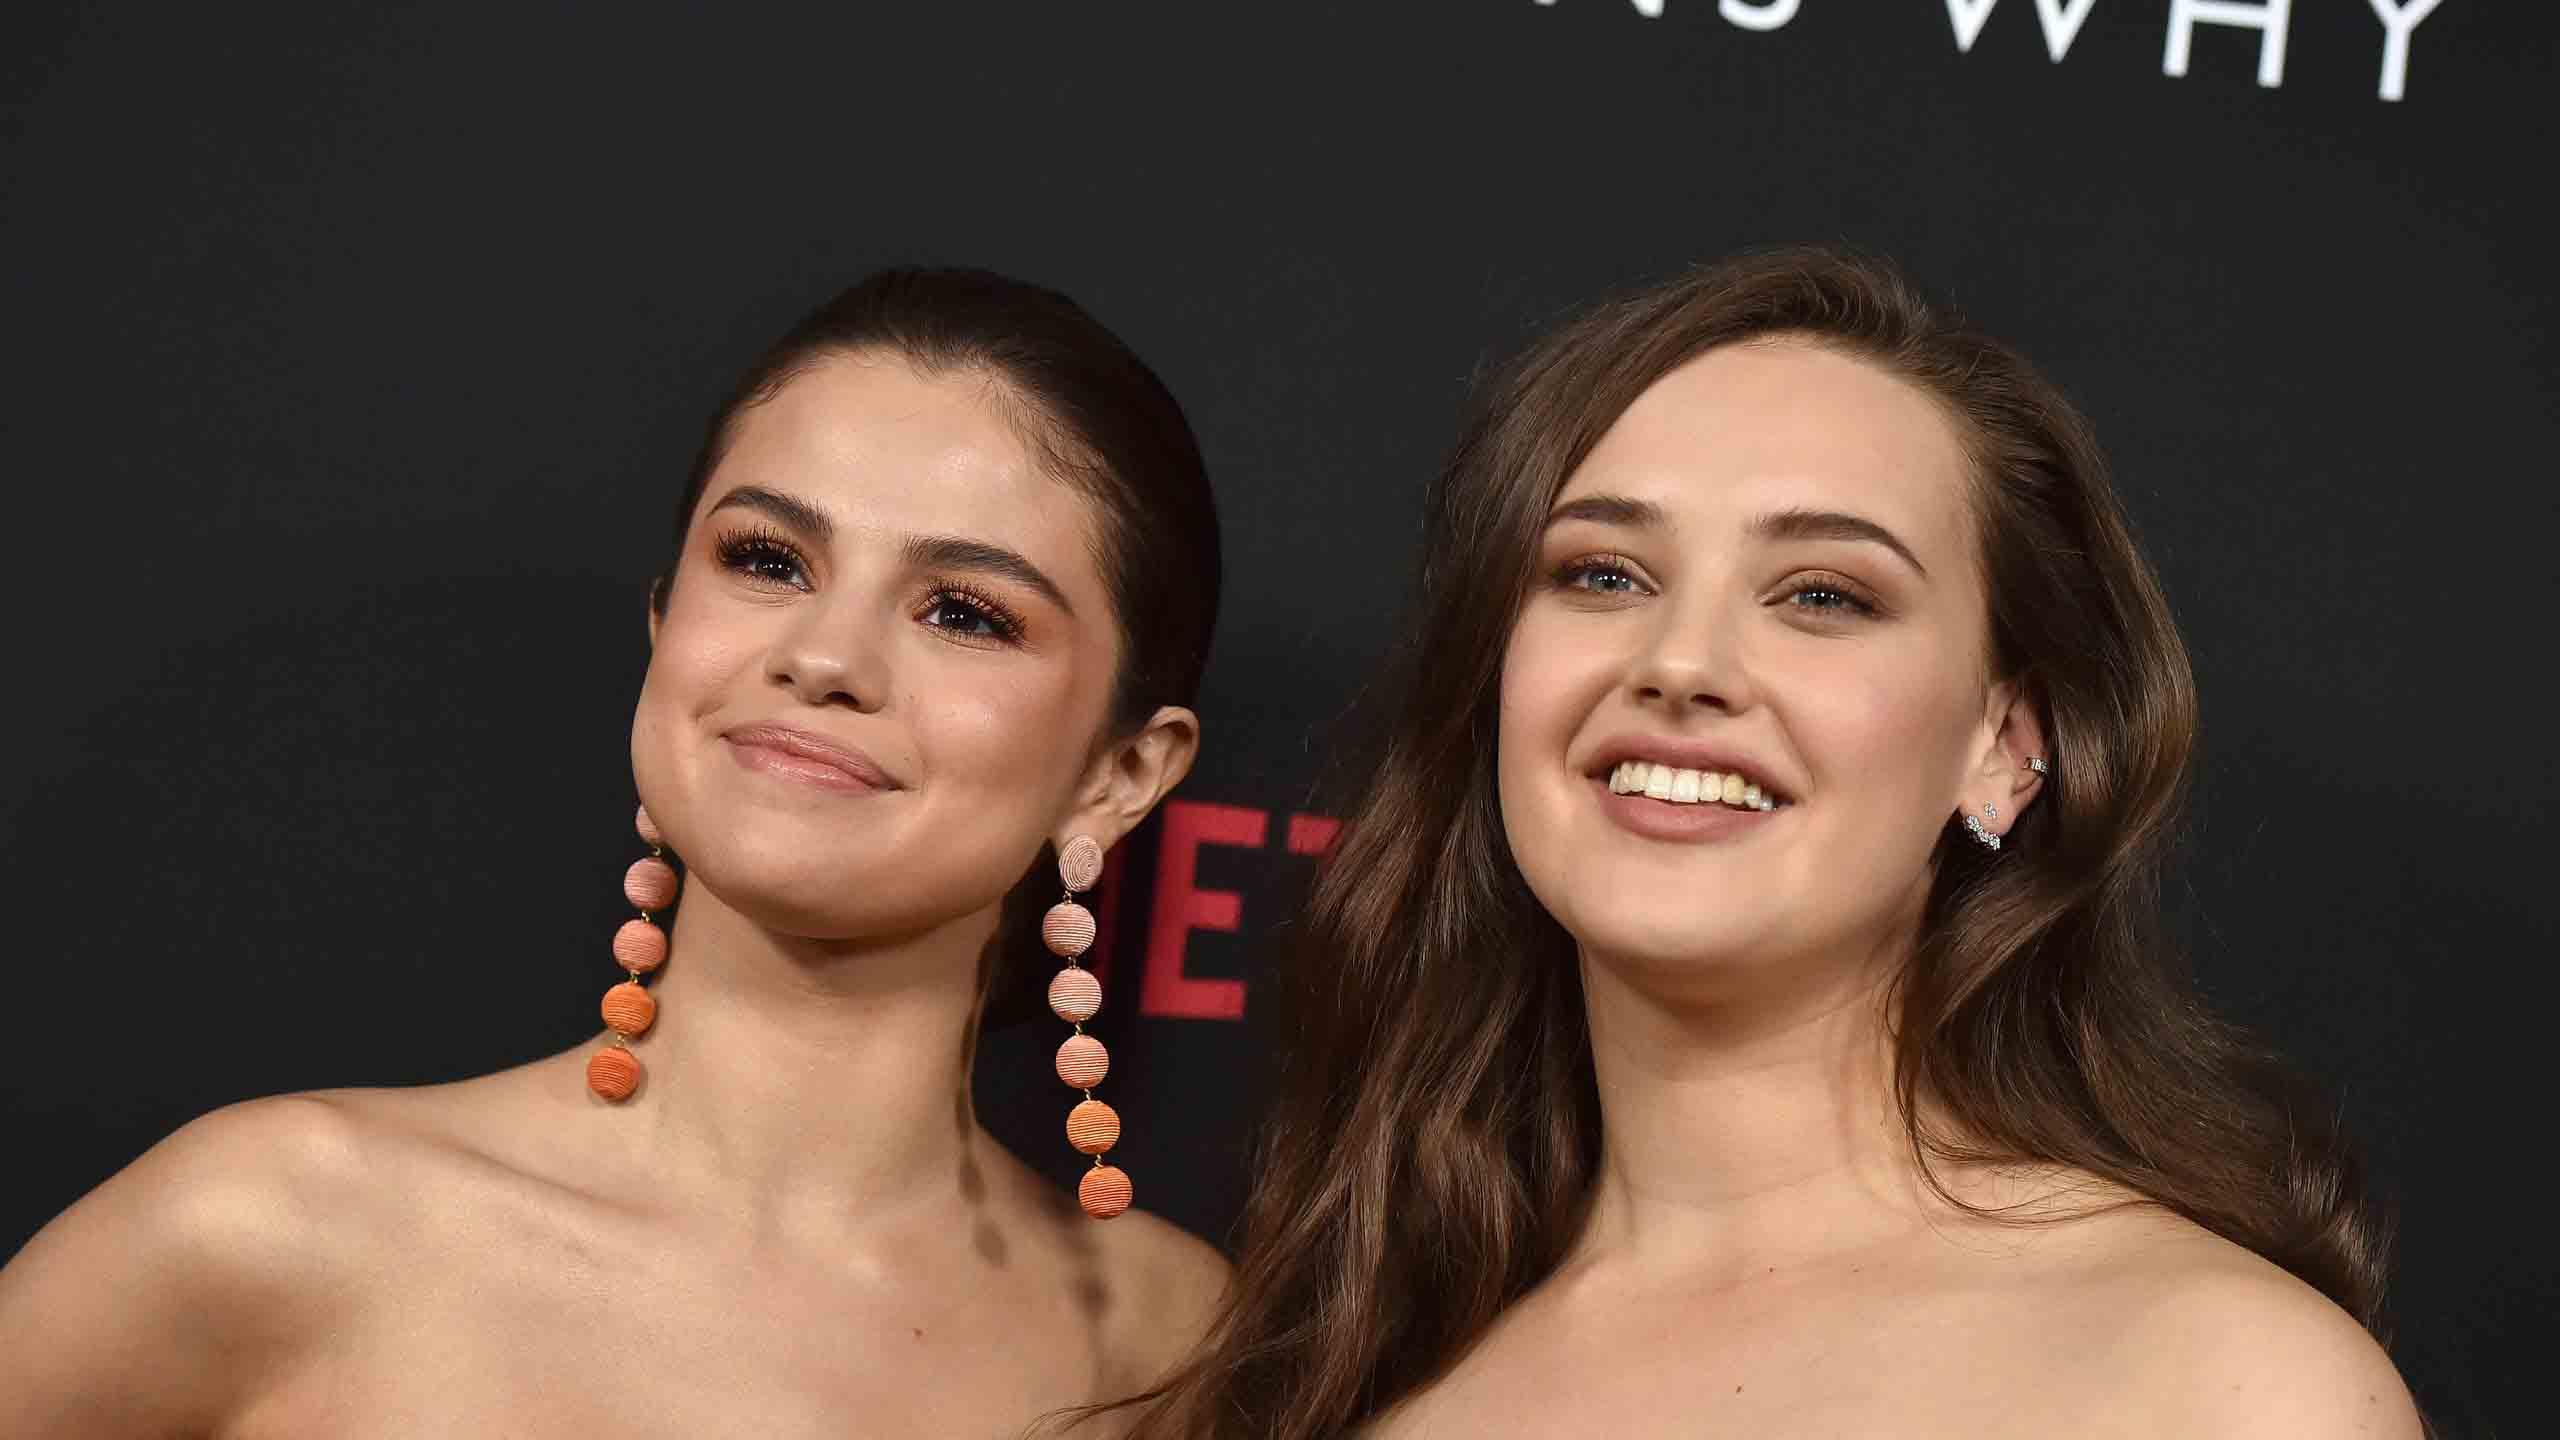 Katherine Langford and Selena Gomez